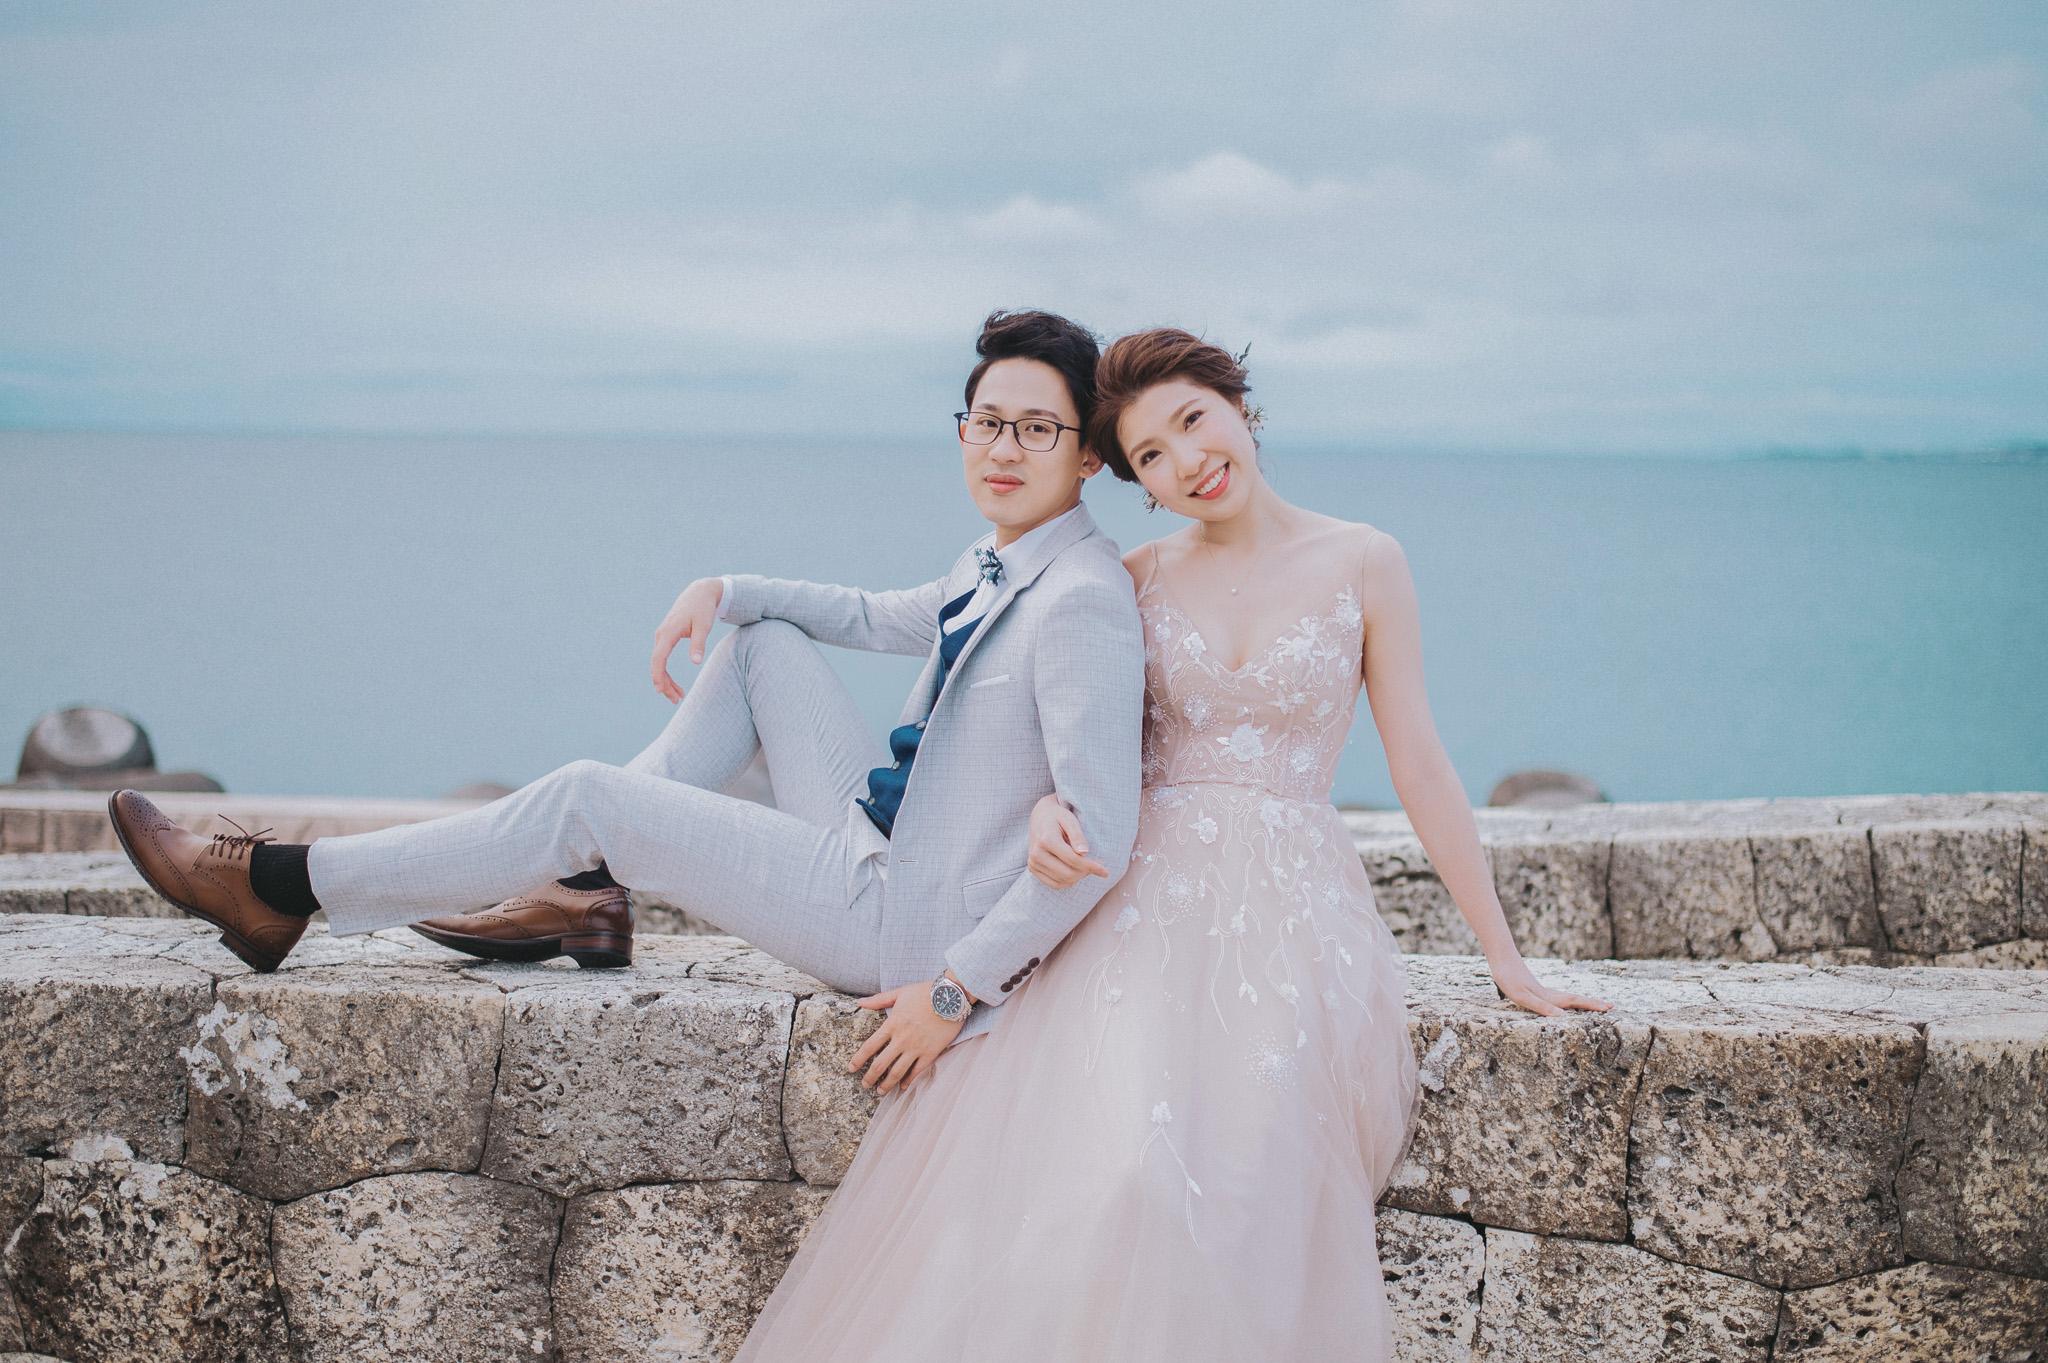 EW Easternwedding 婚攝 居米 婚紗 日本 沖繩